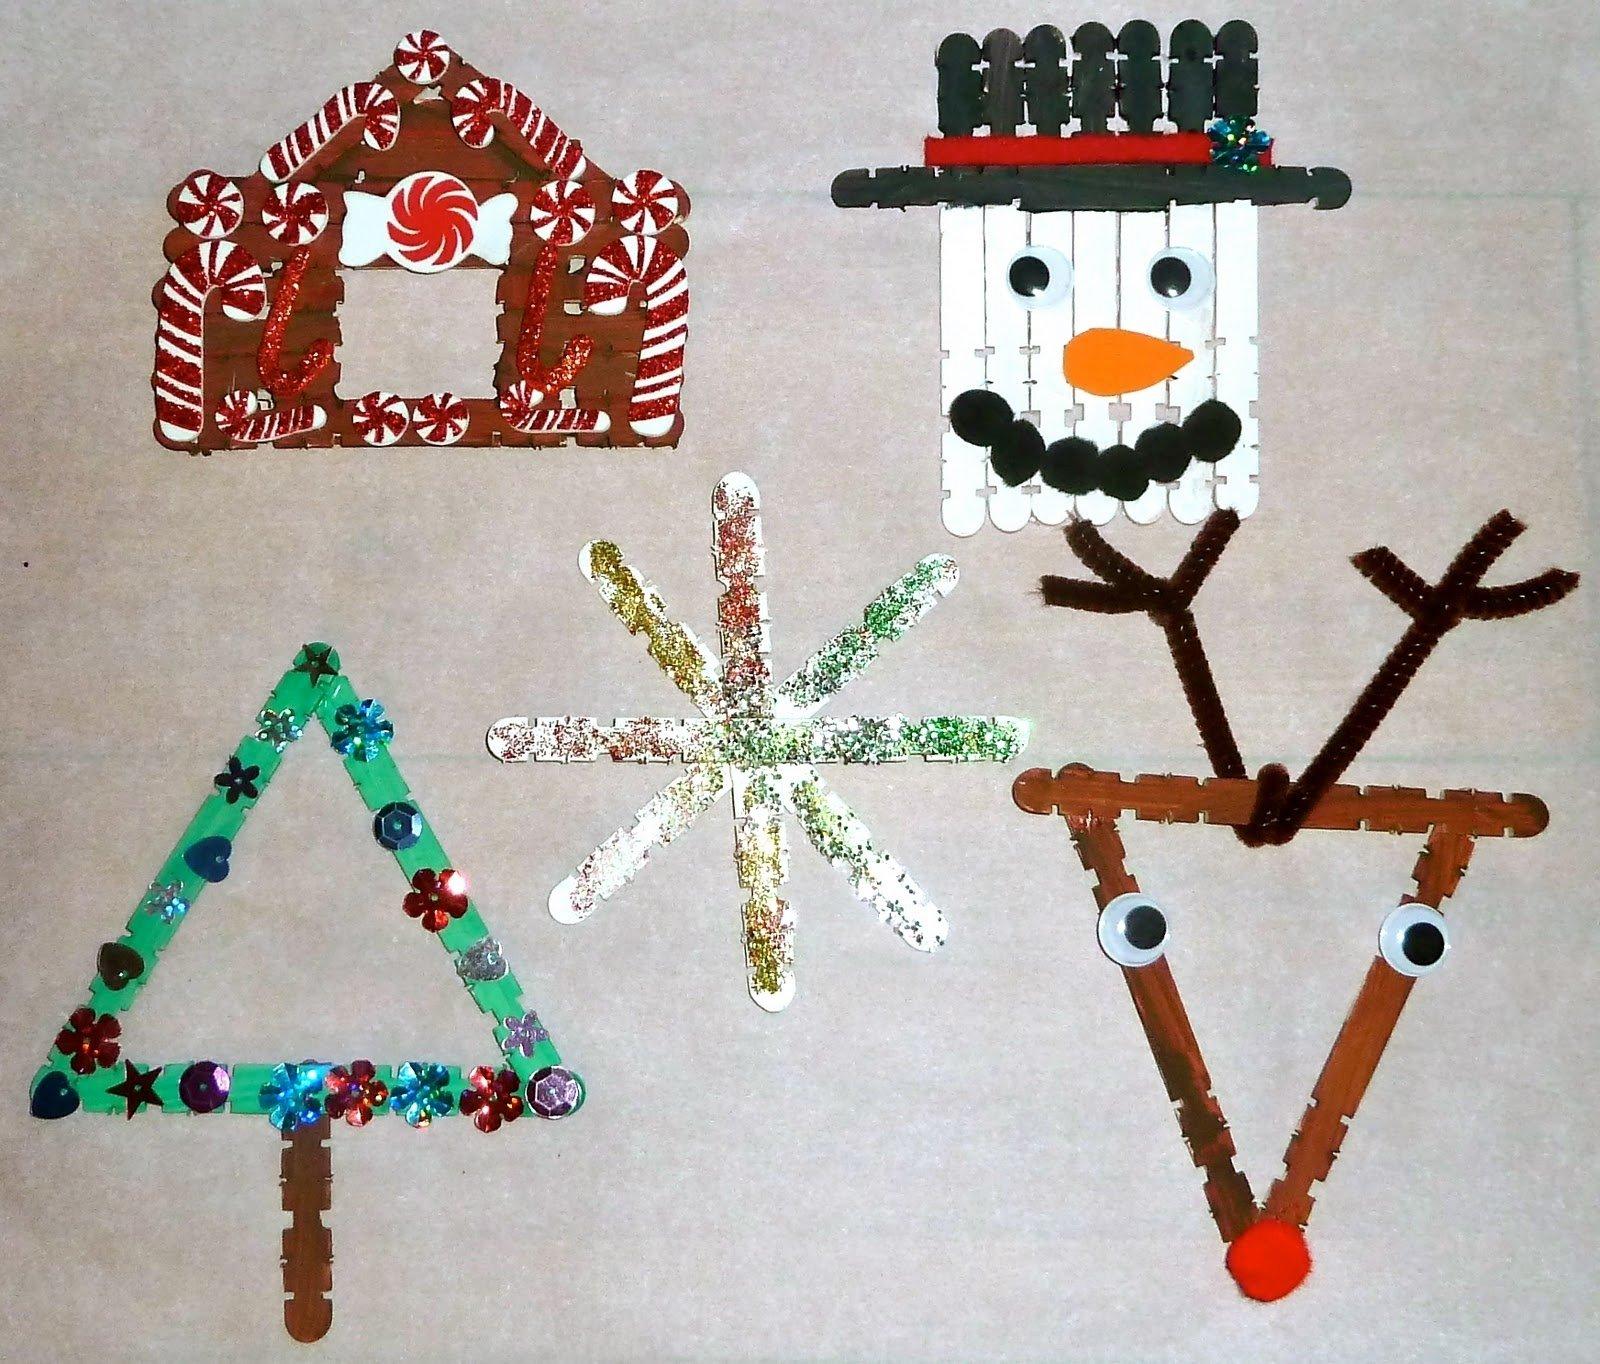 10 Stylish Christmas Craft Ideas For Kids To Make easy christmas crafts for kids e2 80 94 crafthubs craft gifts loversiq 2 2021